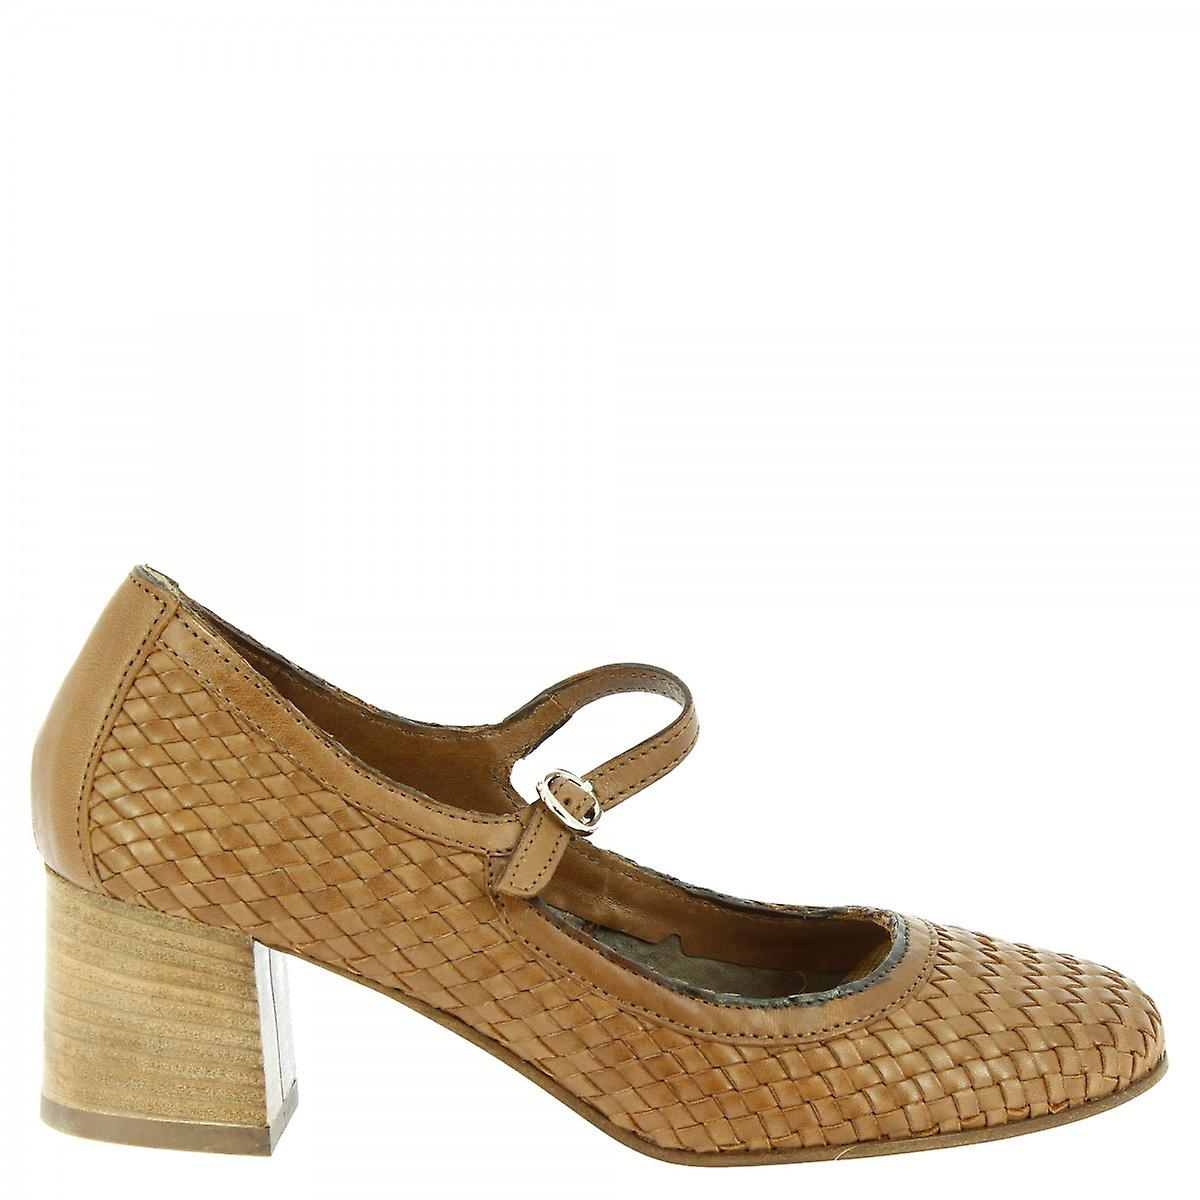 Leonardo Shoes Women's handmade mid heels pumps in brown woven calf leather